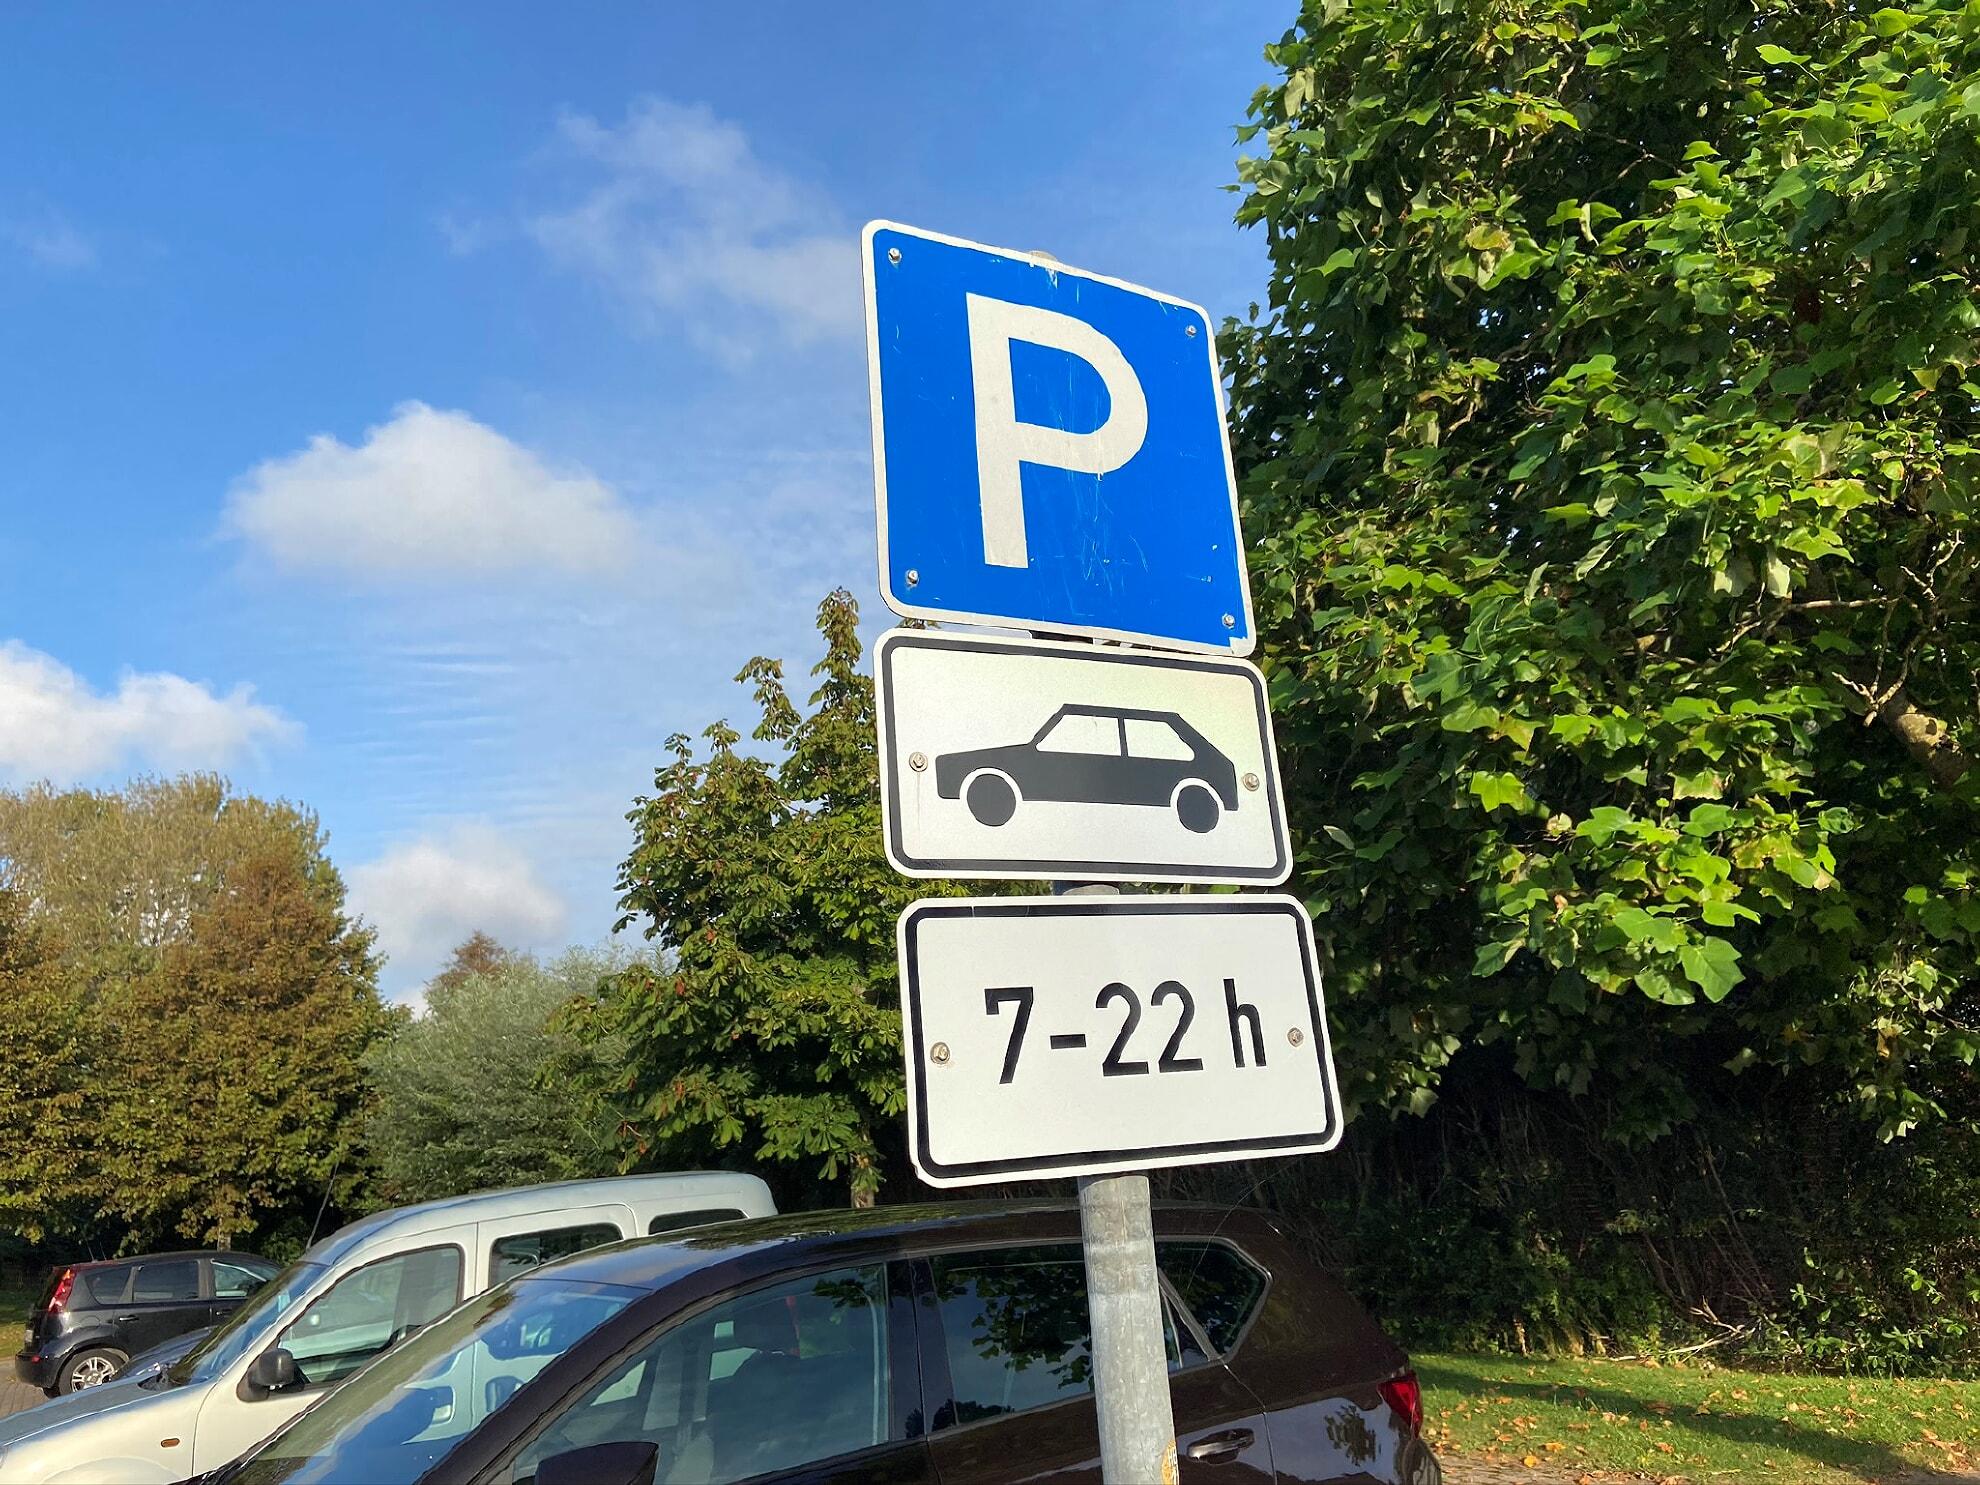 Parkplatz am Tinem Hüs